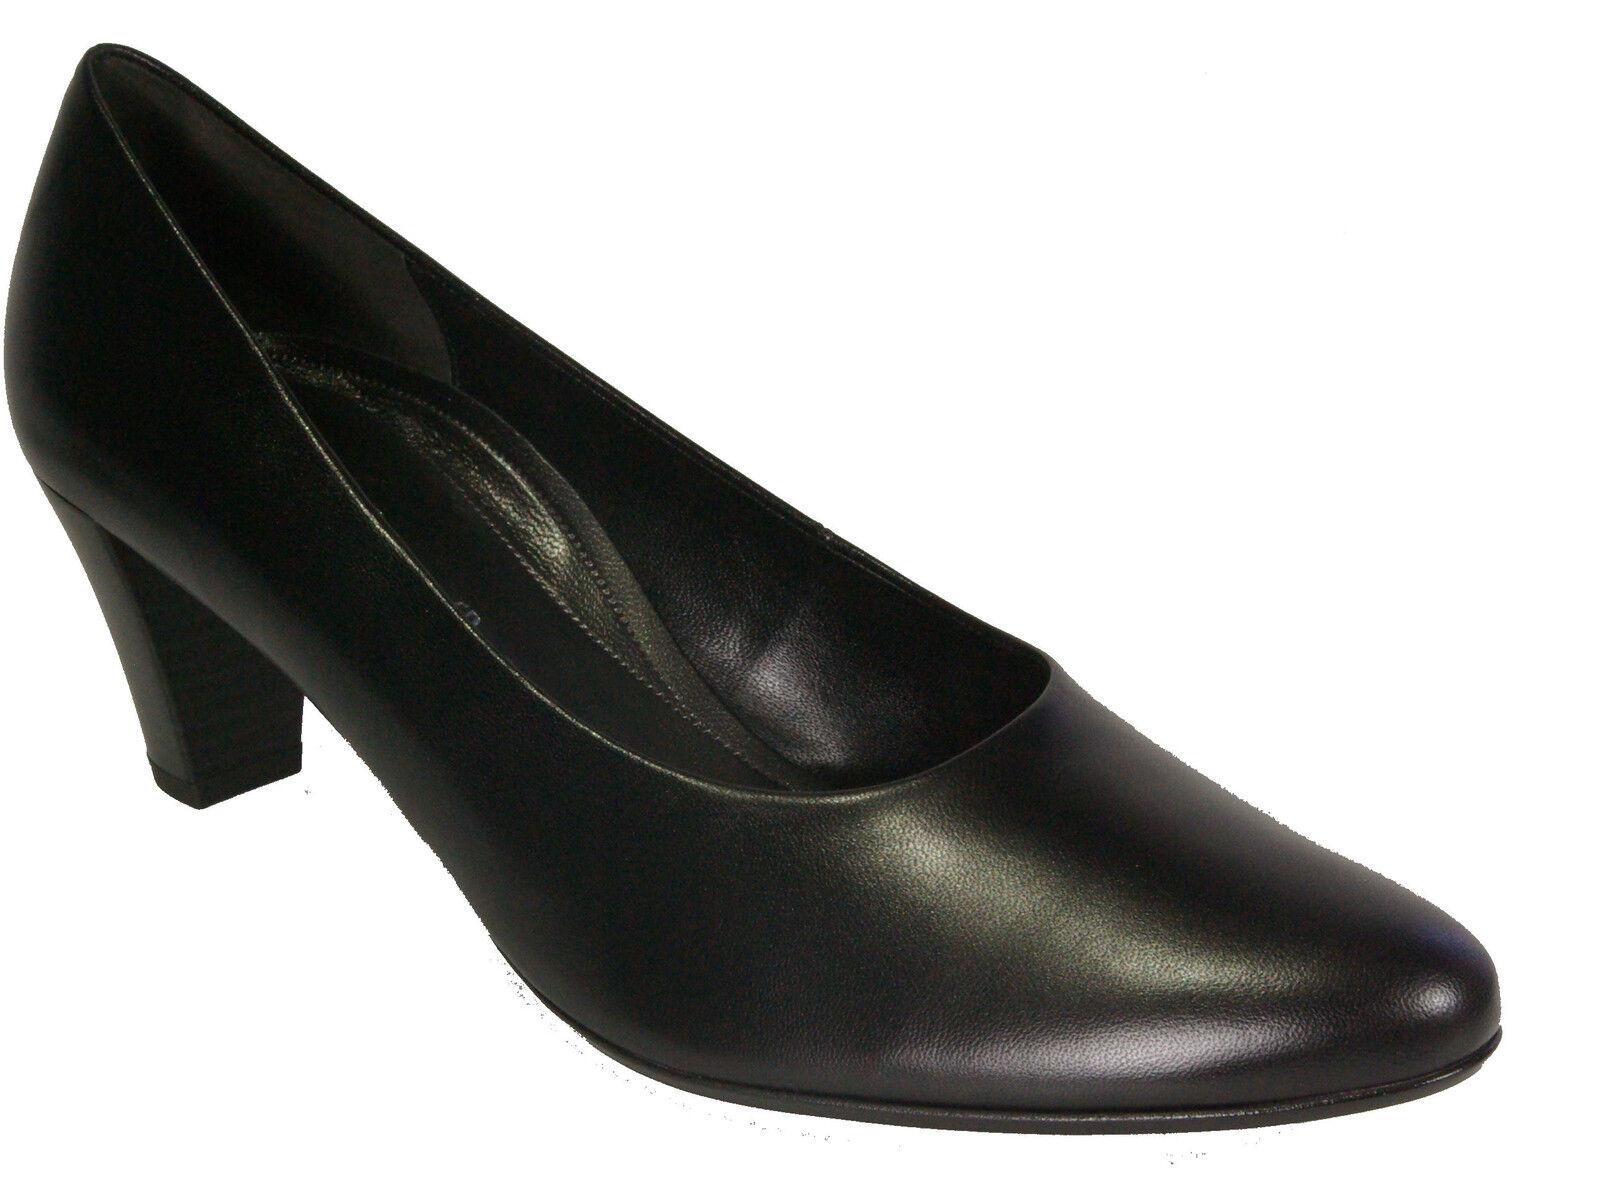 GABOR Schuhe Pumps schwarz Echt Leder G-Weite mm Soft Move Absatz 55 mm G-Weite NEU 0e5996